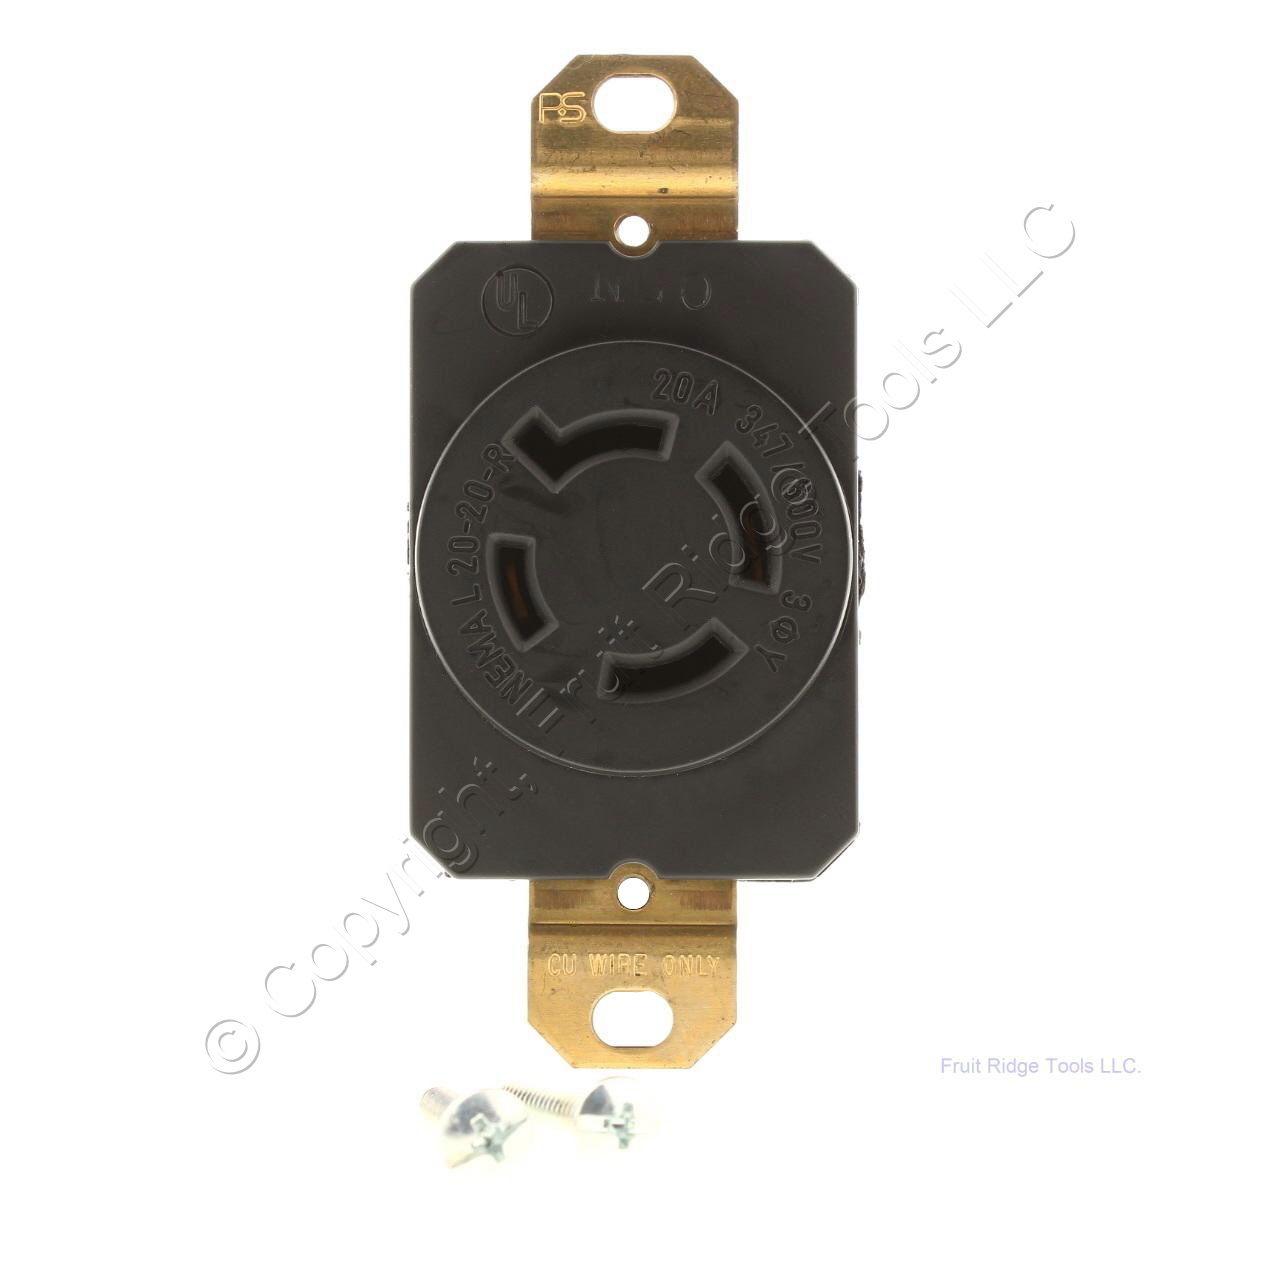 P Amp S Twist Turn Locking Receptacle Outlet Nema L20 20r 20a